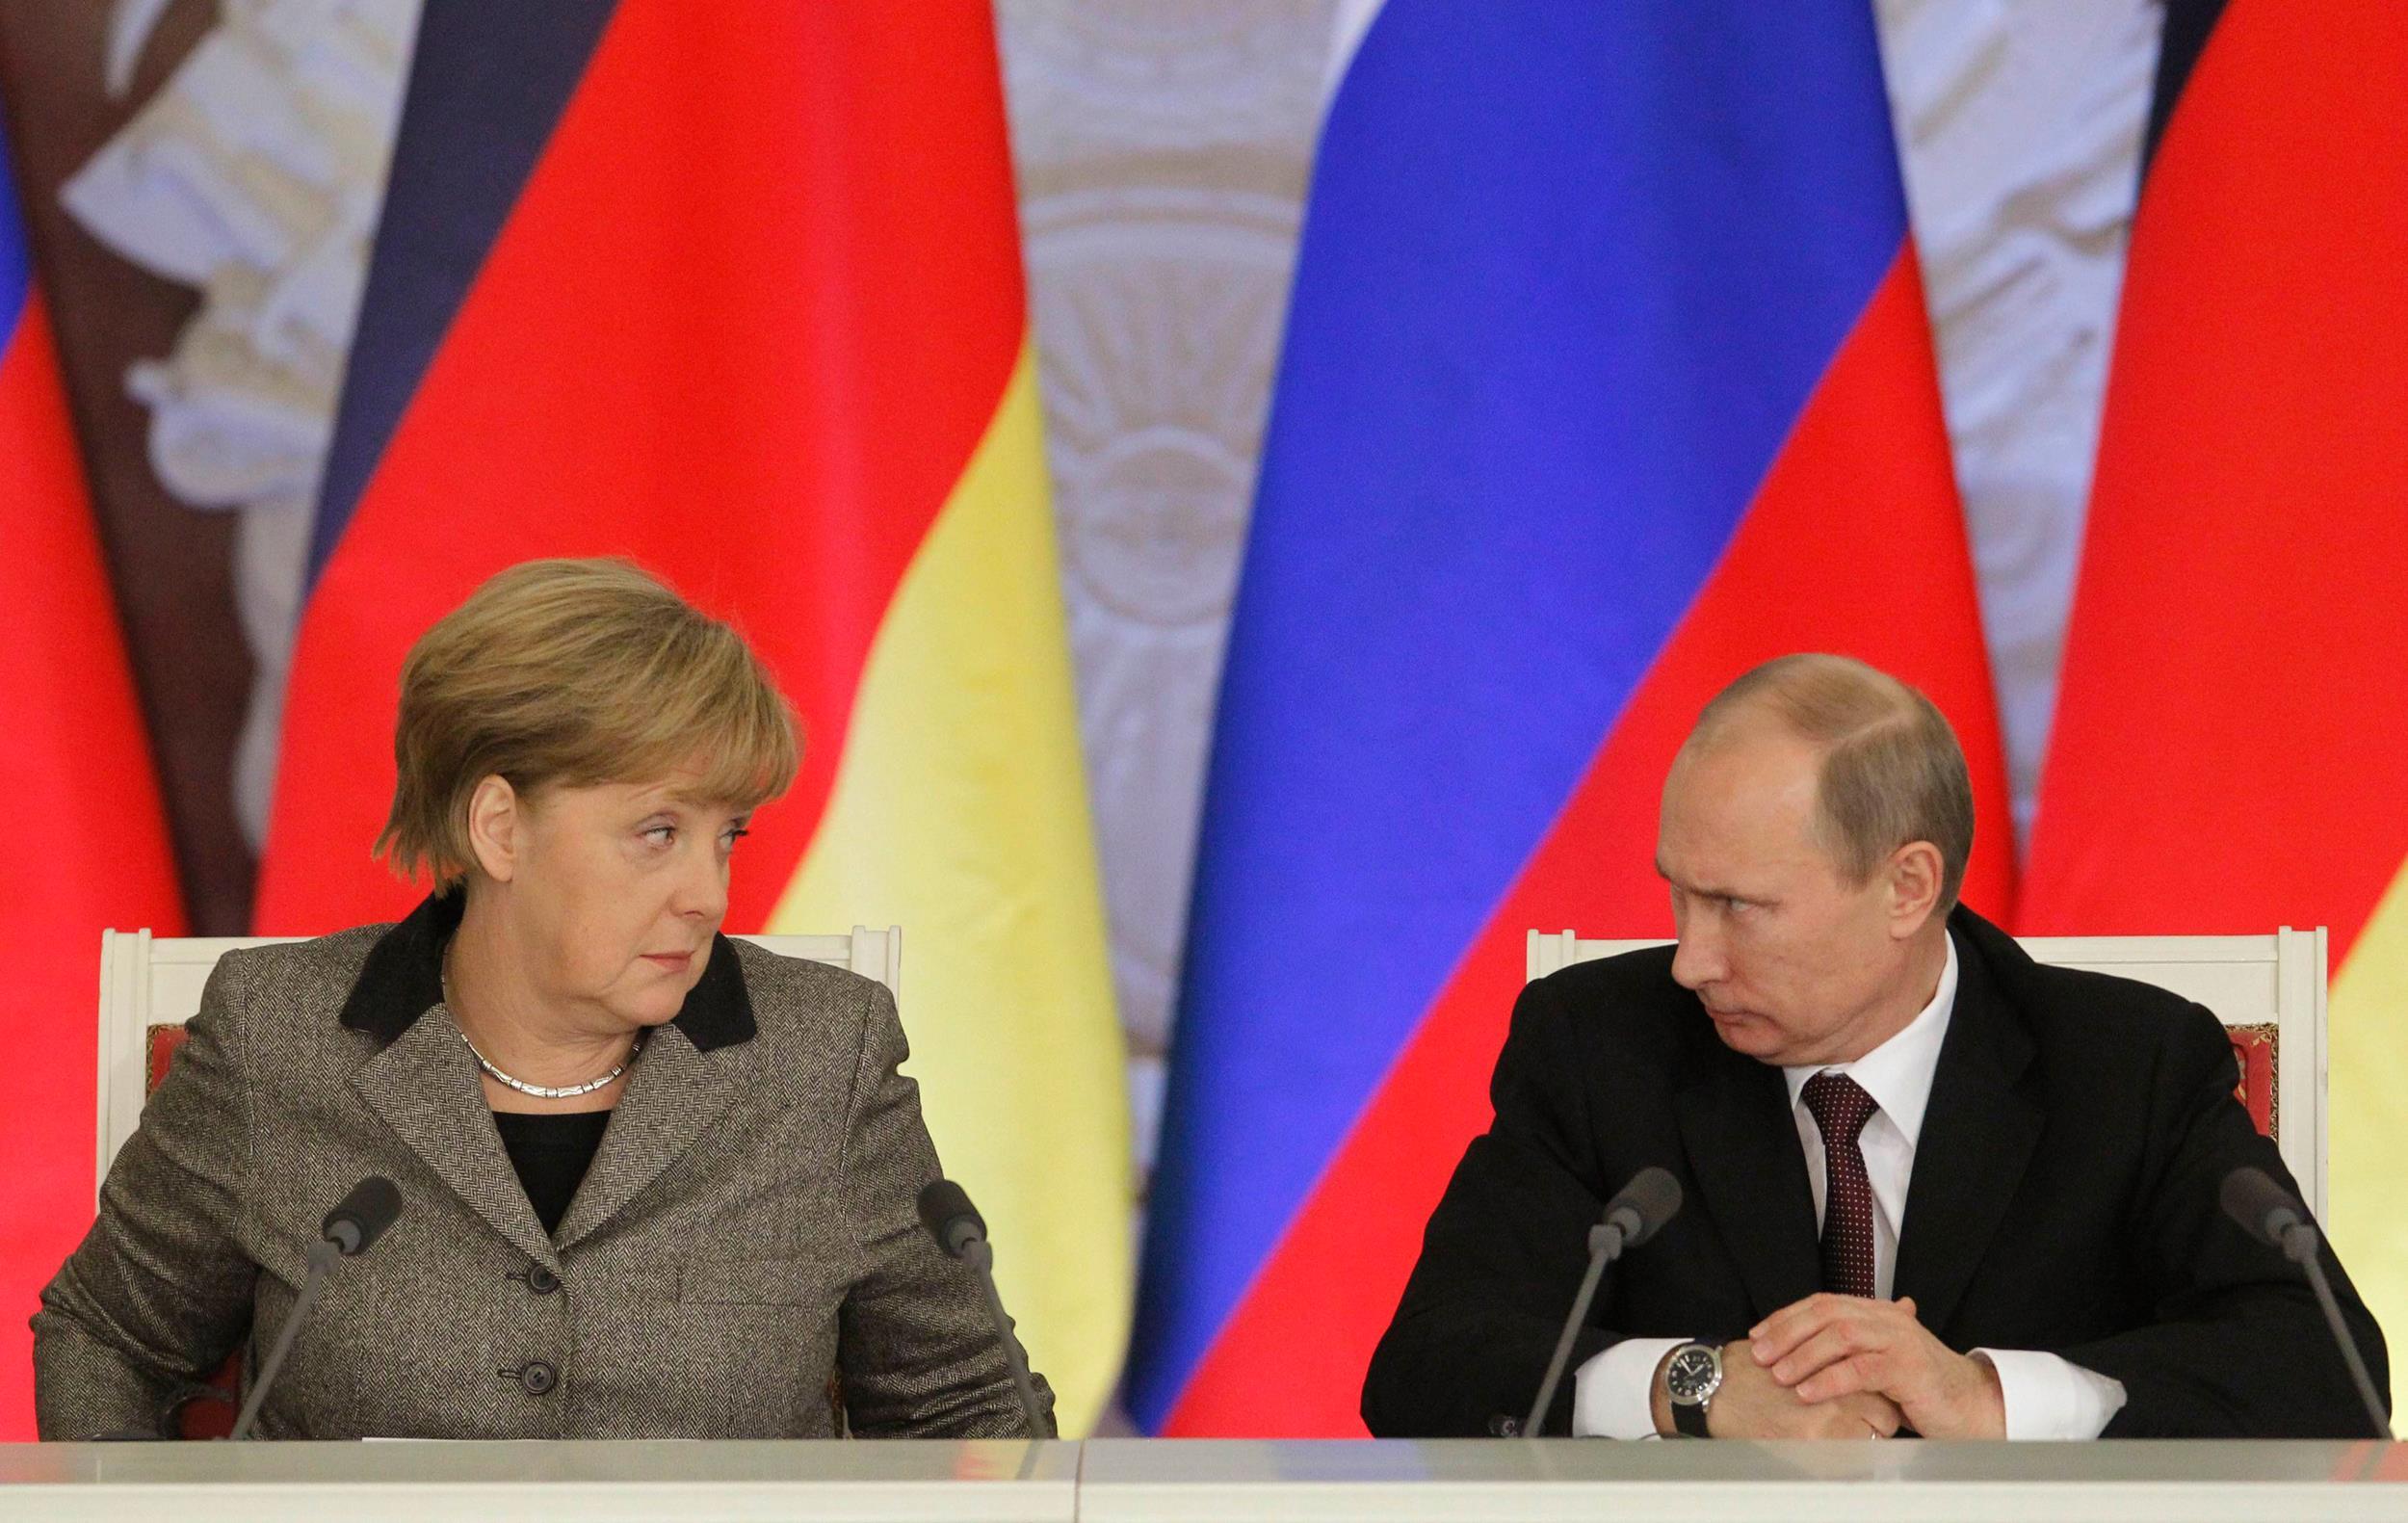 Image: German Chancellor Angela Merkel and Russian President Vladimir Putin